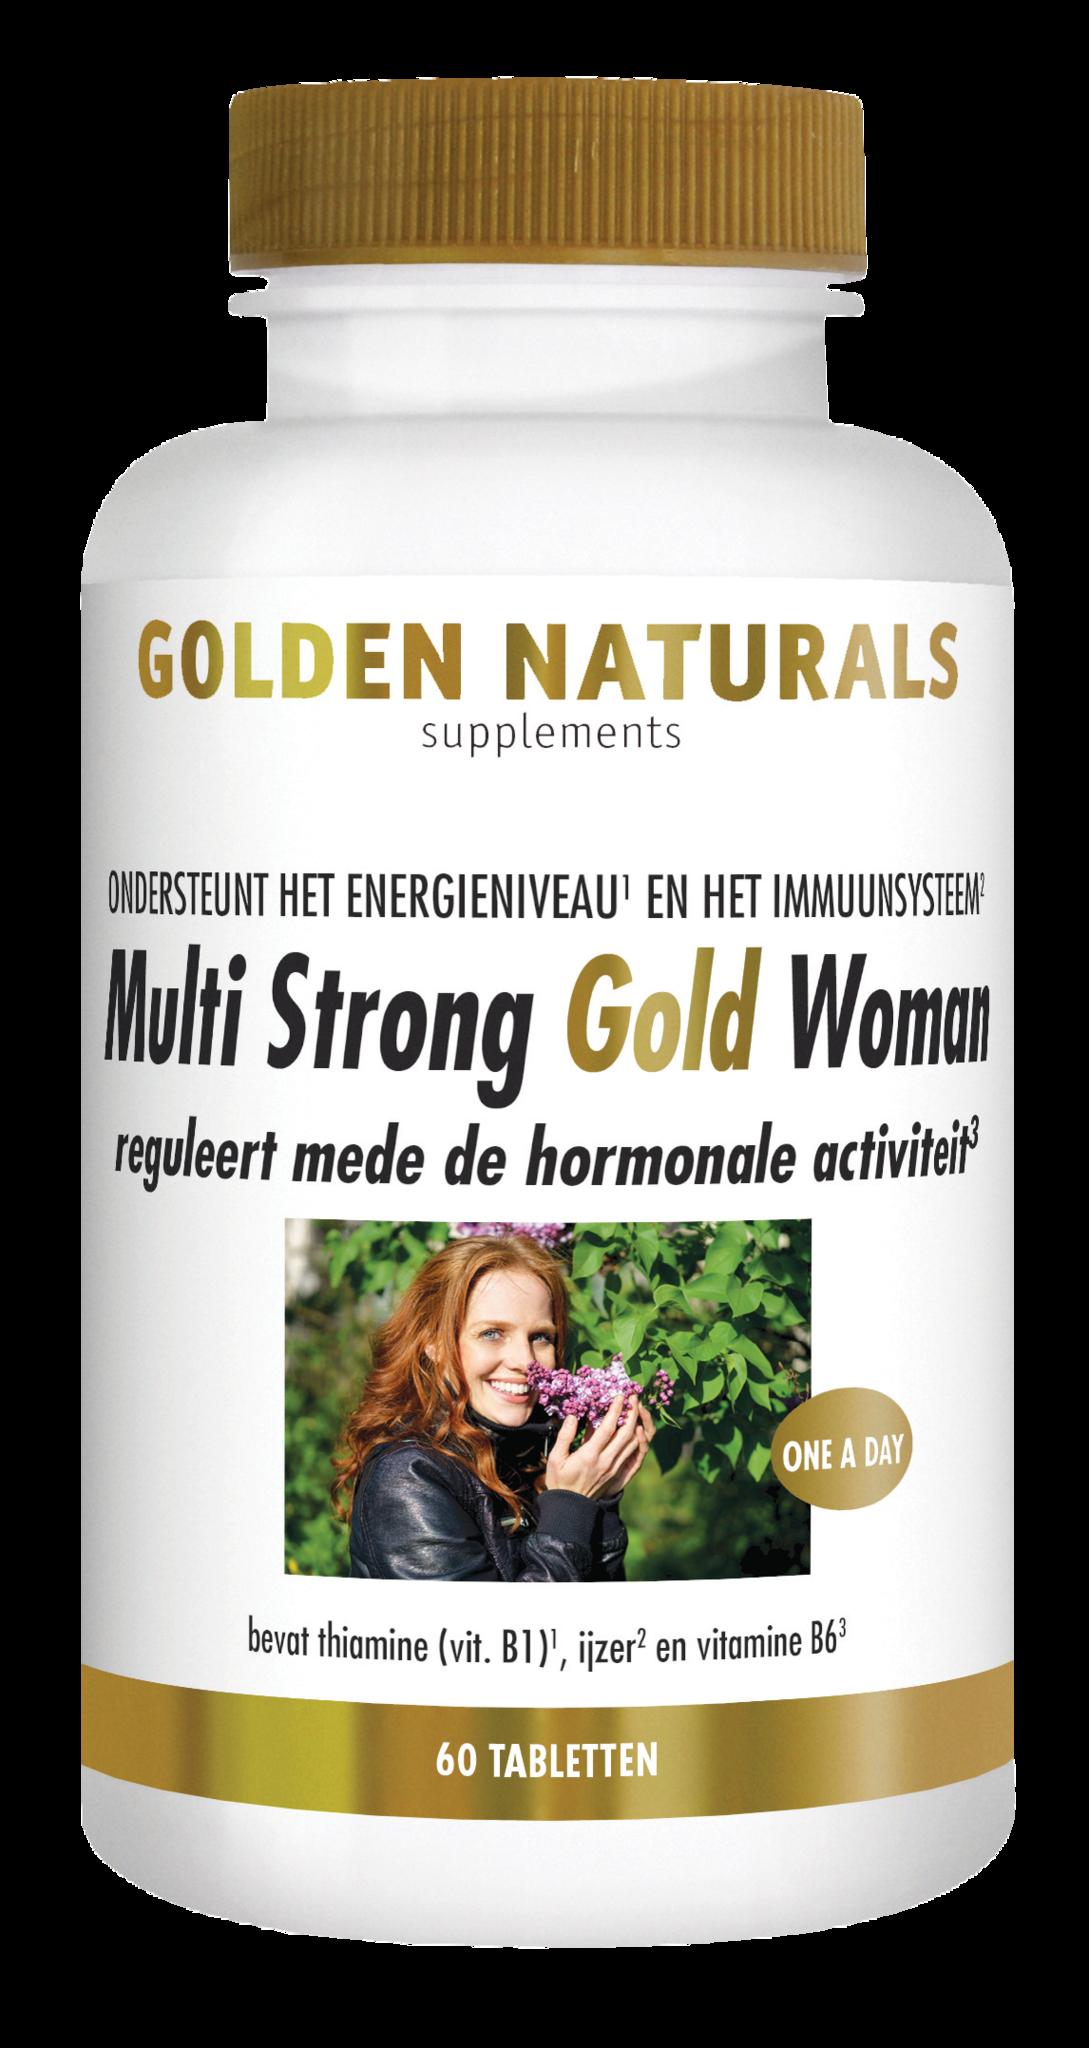 Golden Naturals Multi Strong Gold Woman